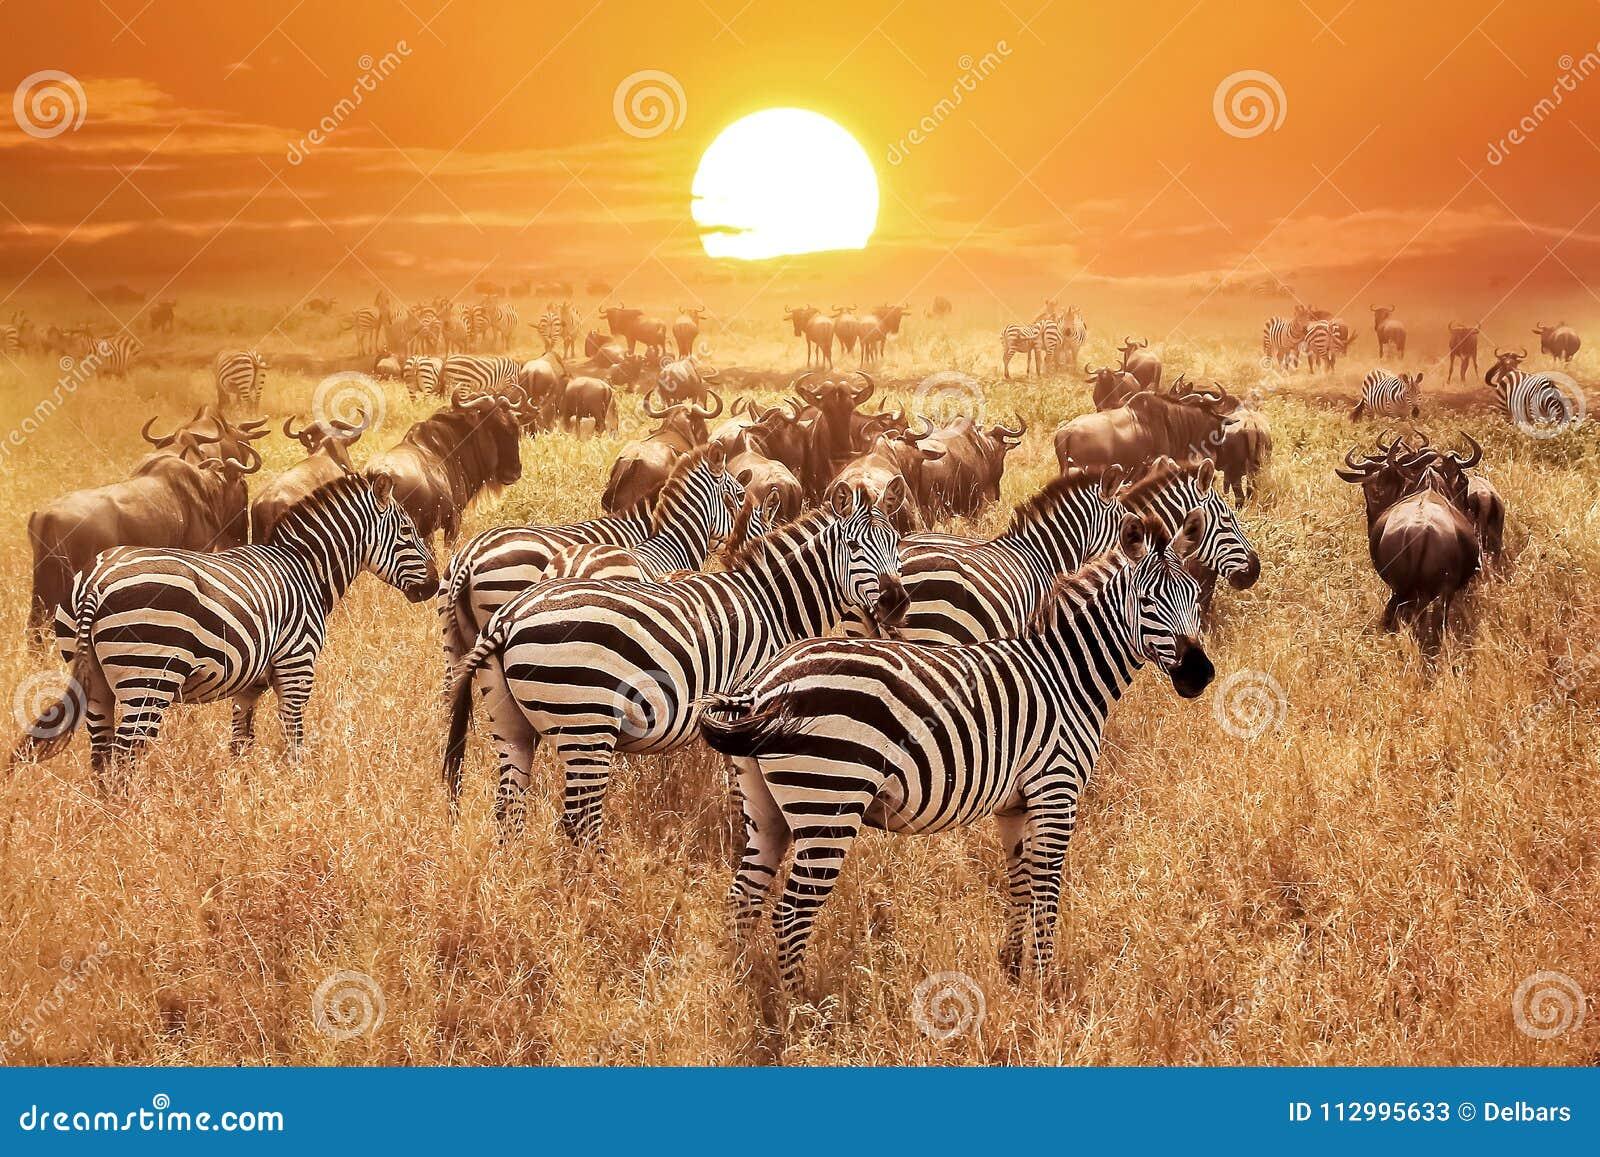 Zebra bei Sonnenuntergang im Nationalpark Serengeti afrika tanzania